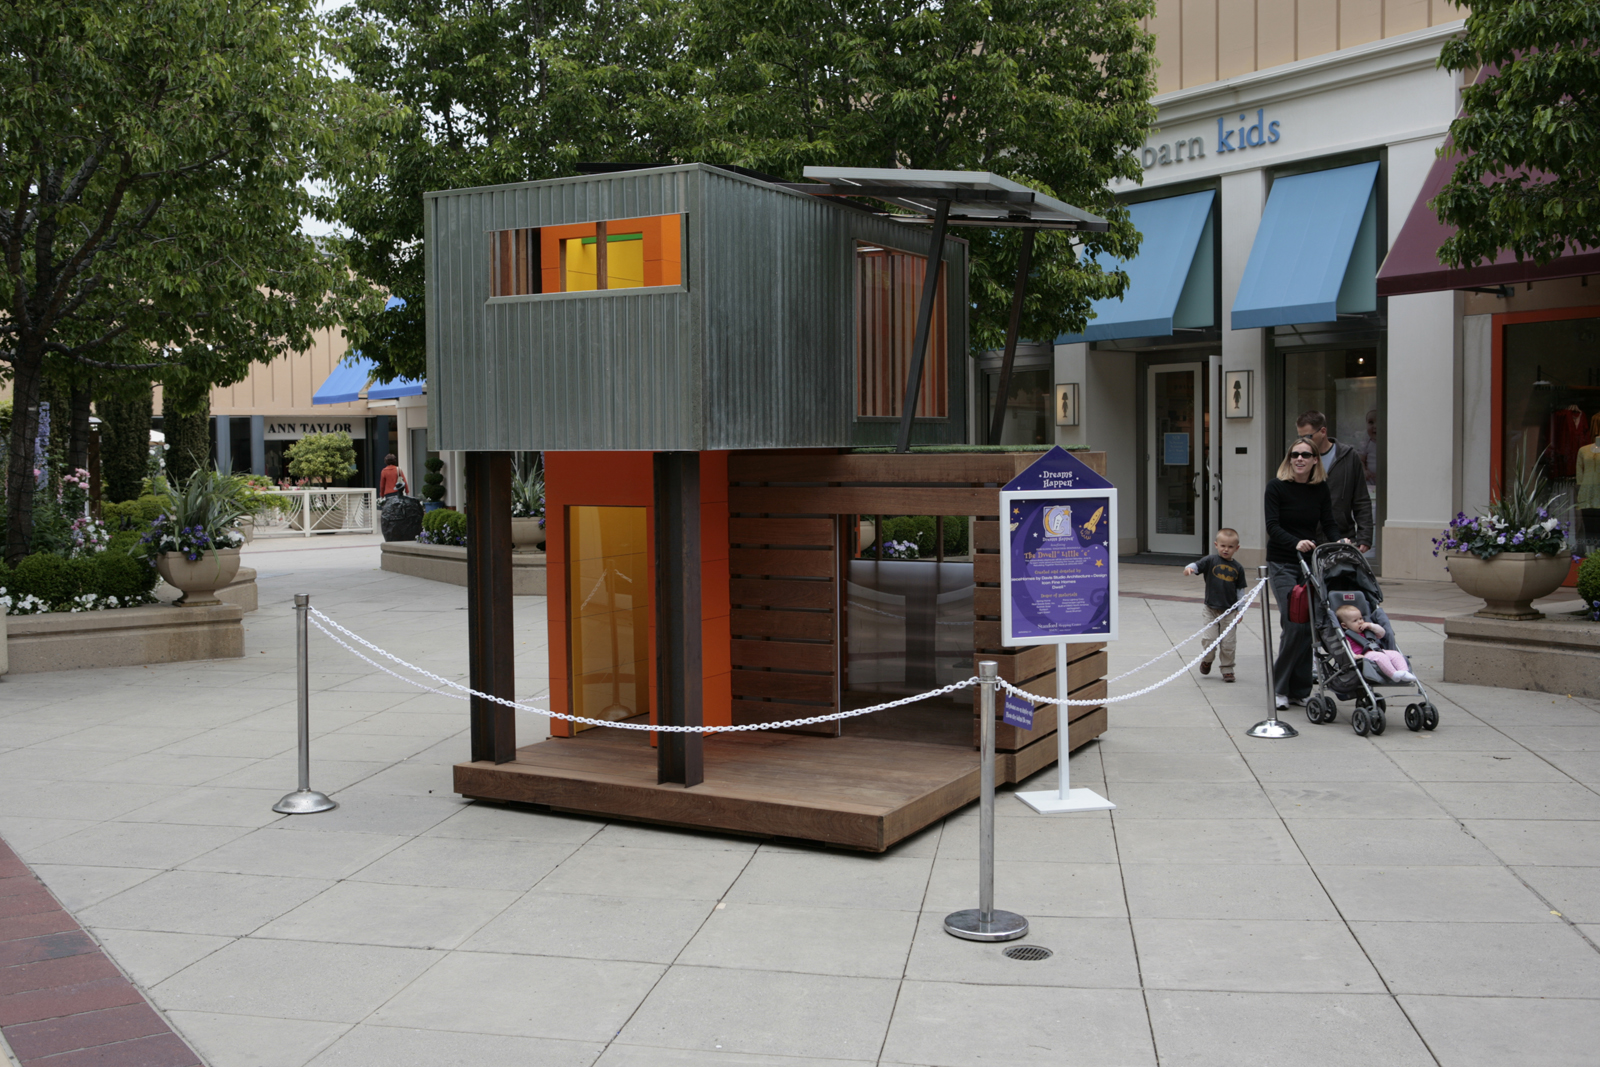 rebuilding together playhouse